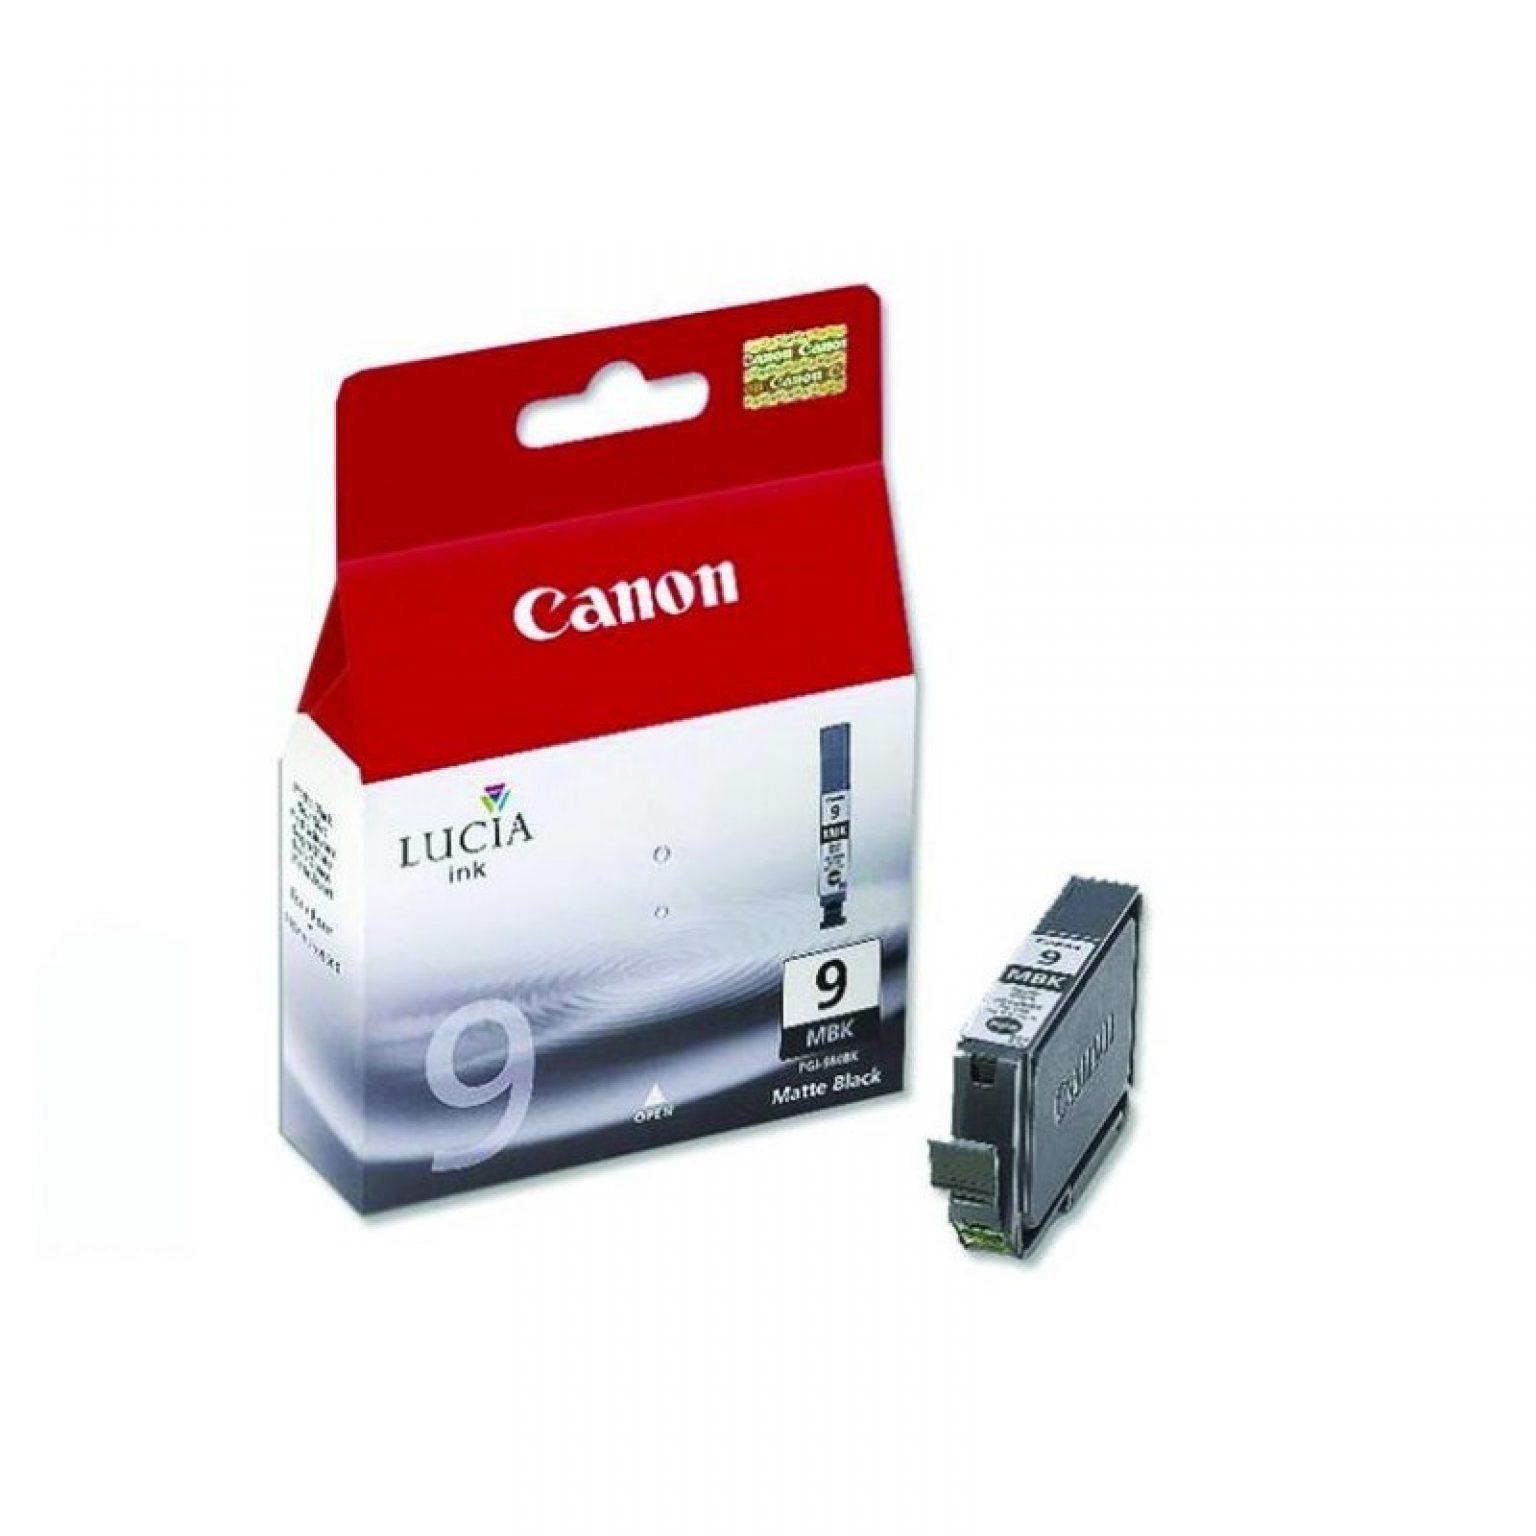 CANON - Ink Cartridge PGI-9 Matte Black (LUCIA INK) [PGI-9 MBK]